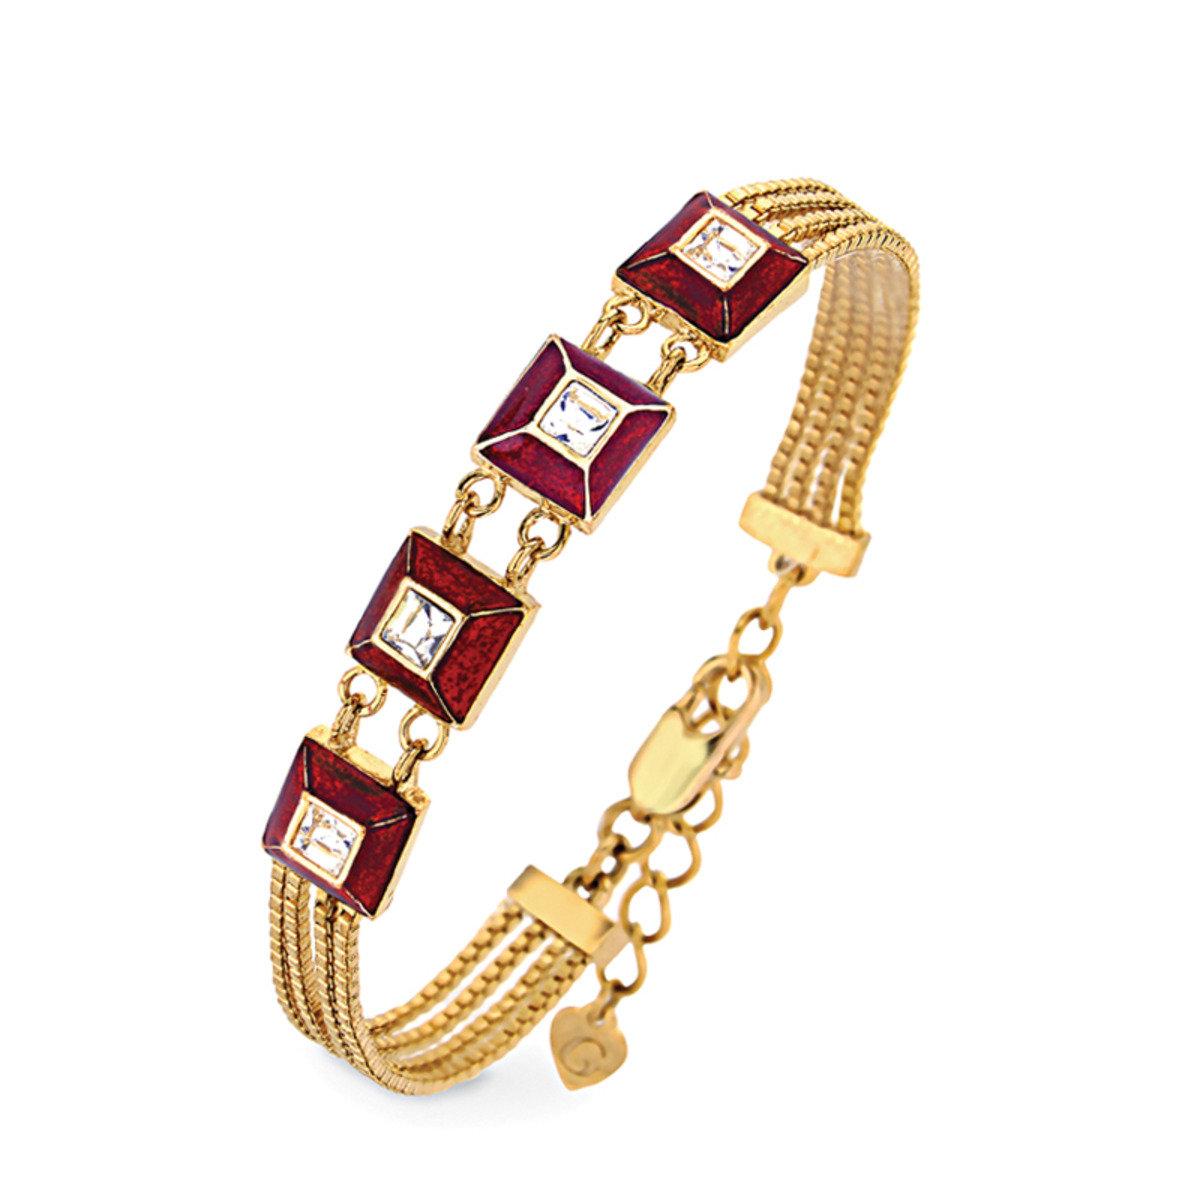 Pyramide bracelet